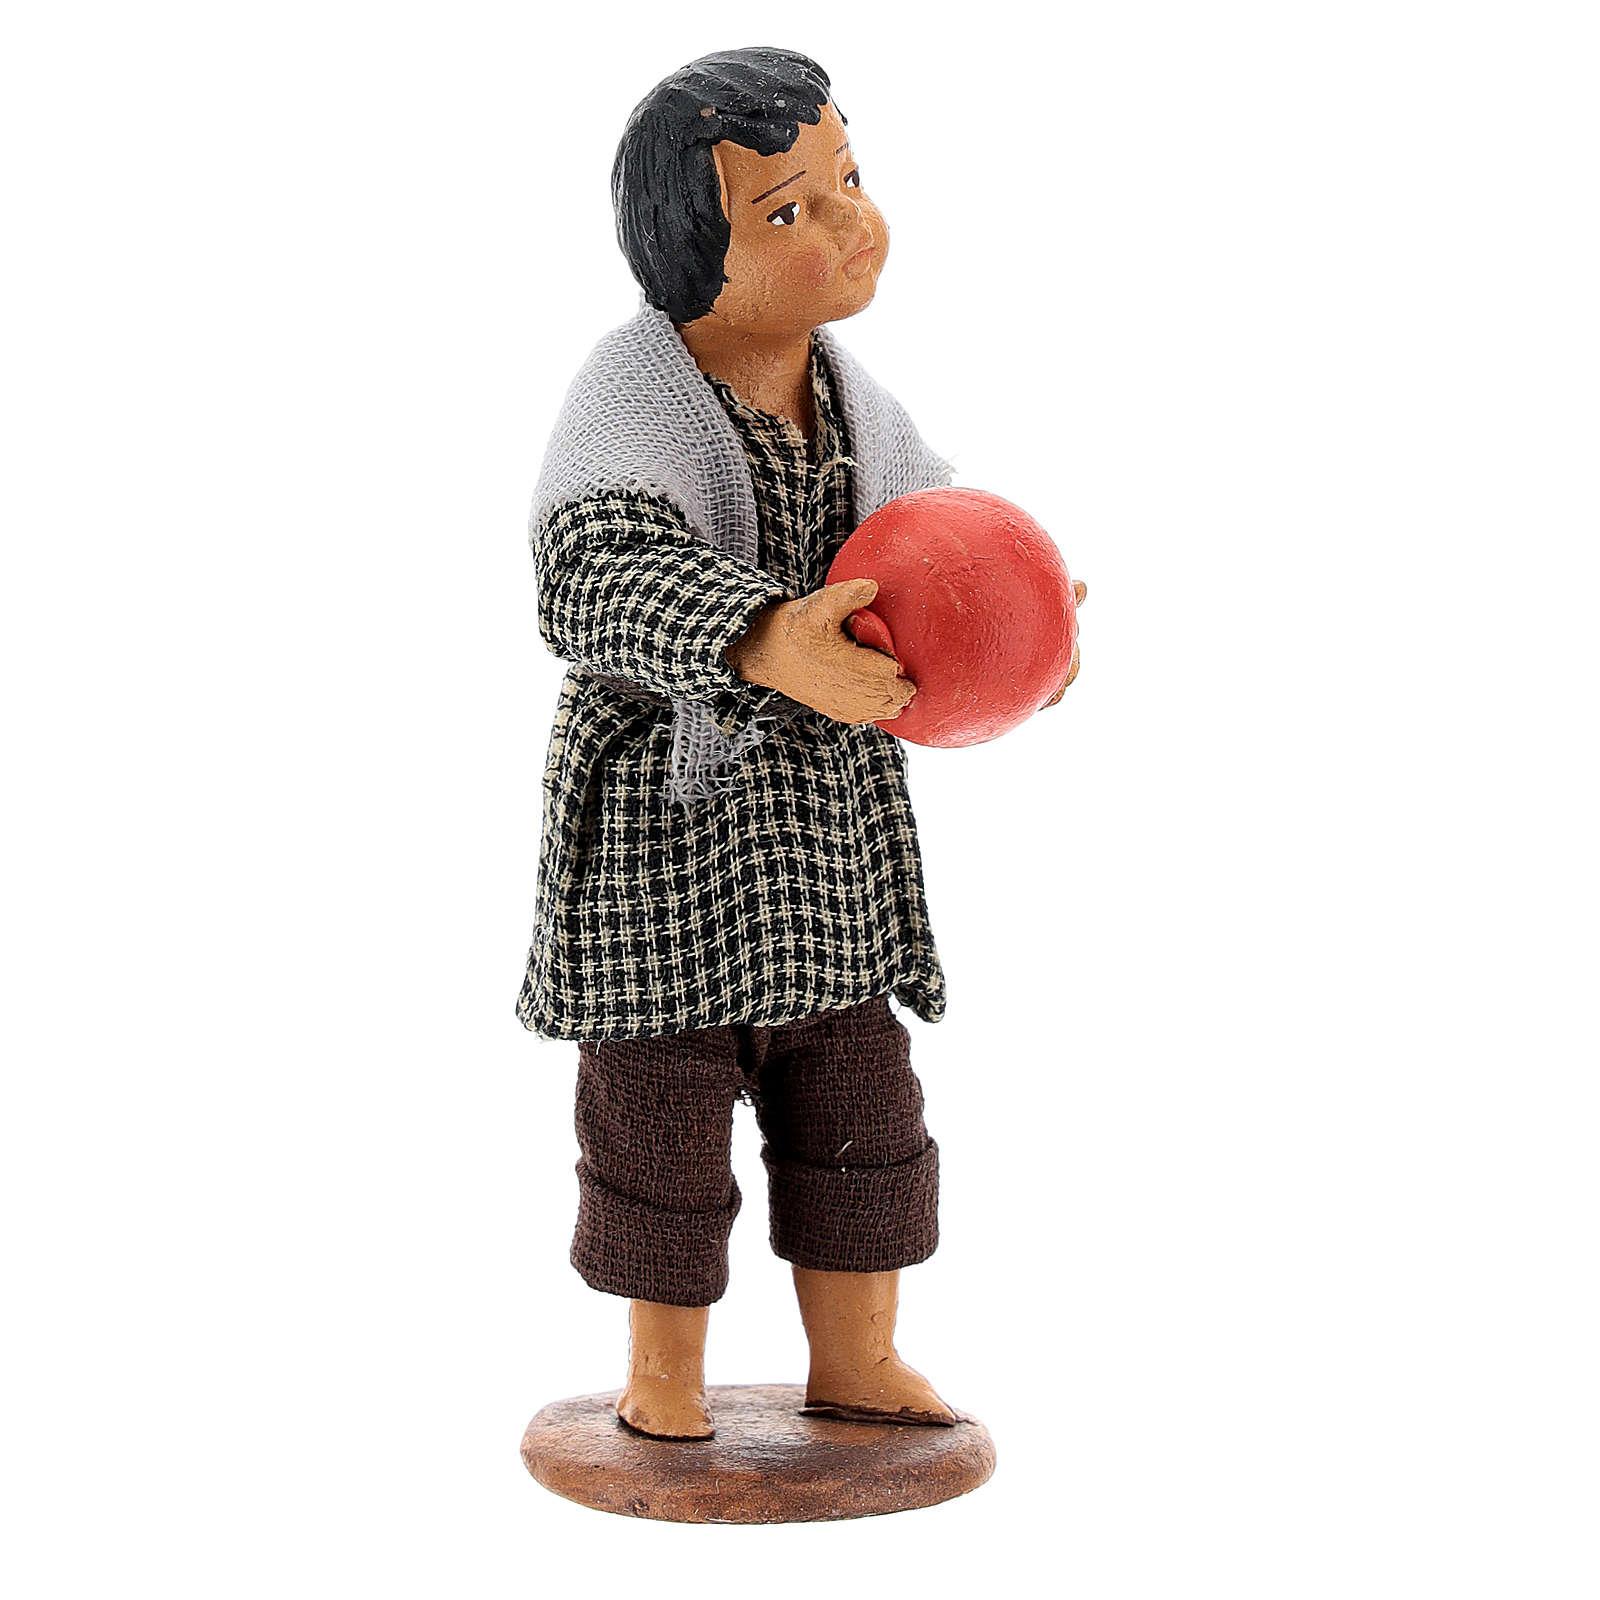 Child with ball,  nativity scene figurine 14 cm 4